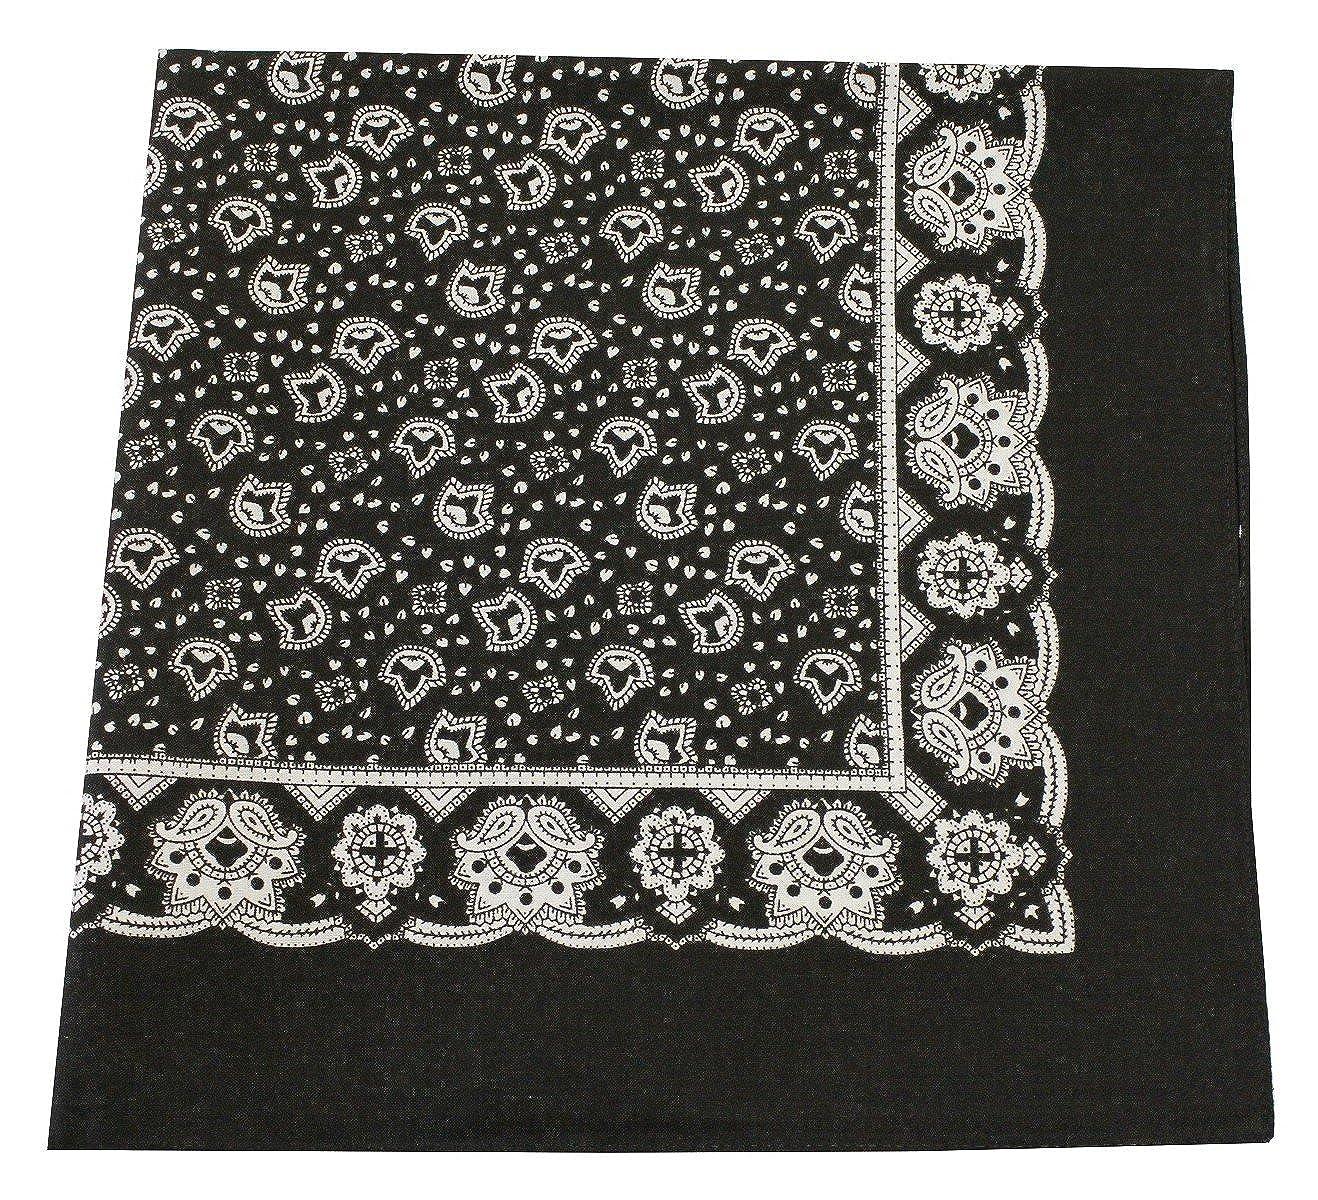 Tobeni 548 Bandana Headscarf Napkin in 100 Cotton for Women and Men